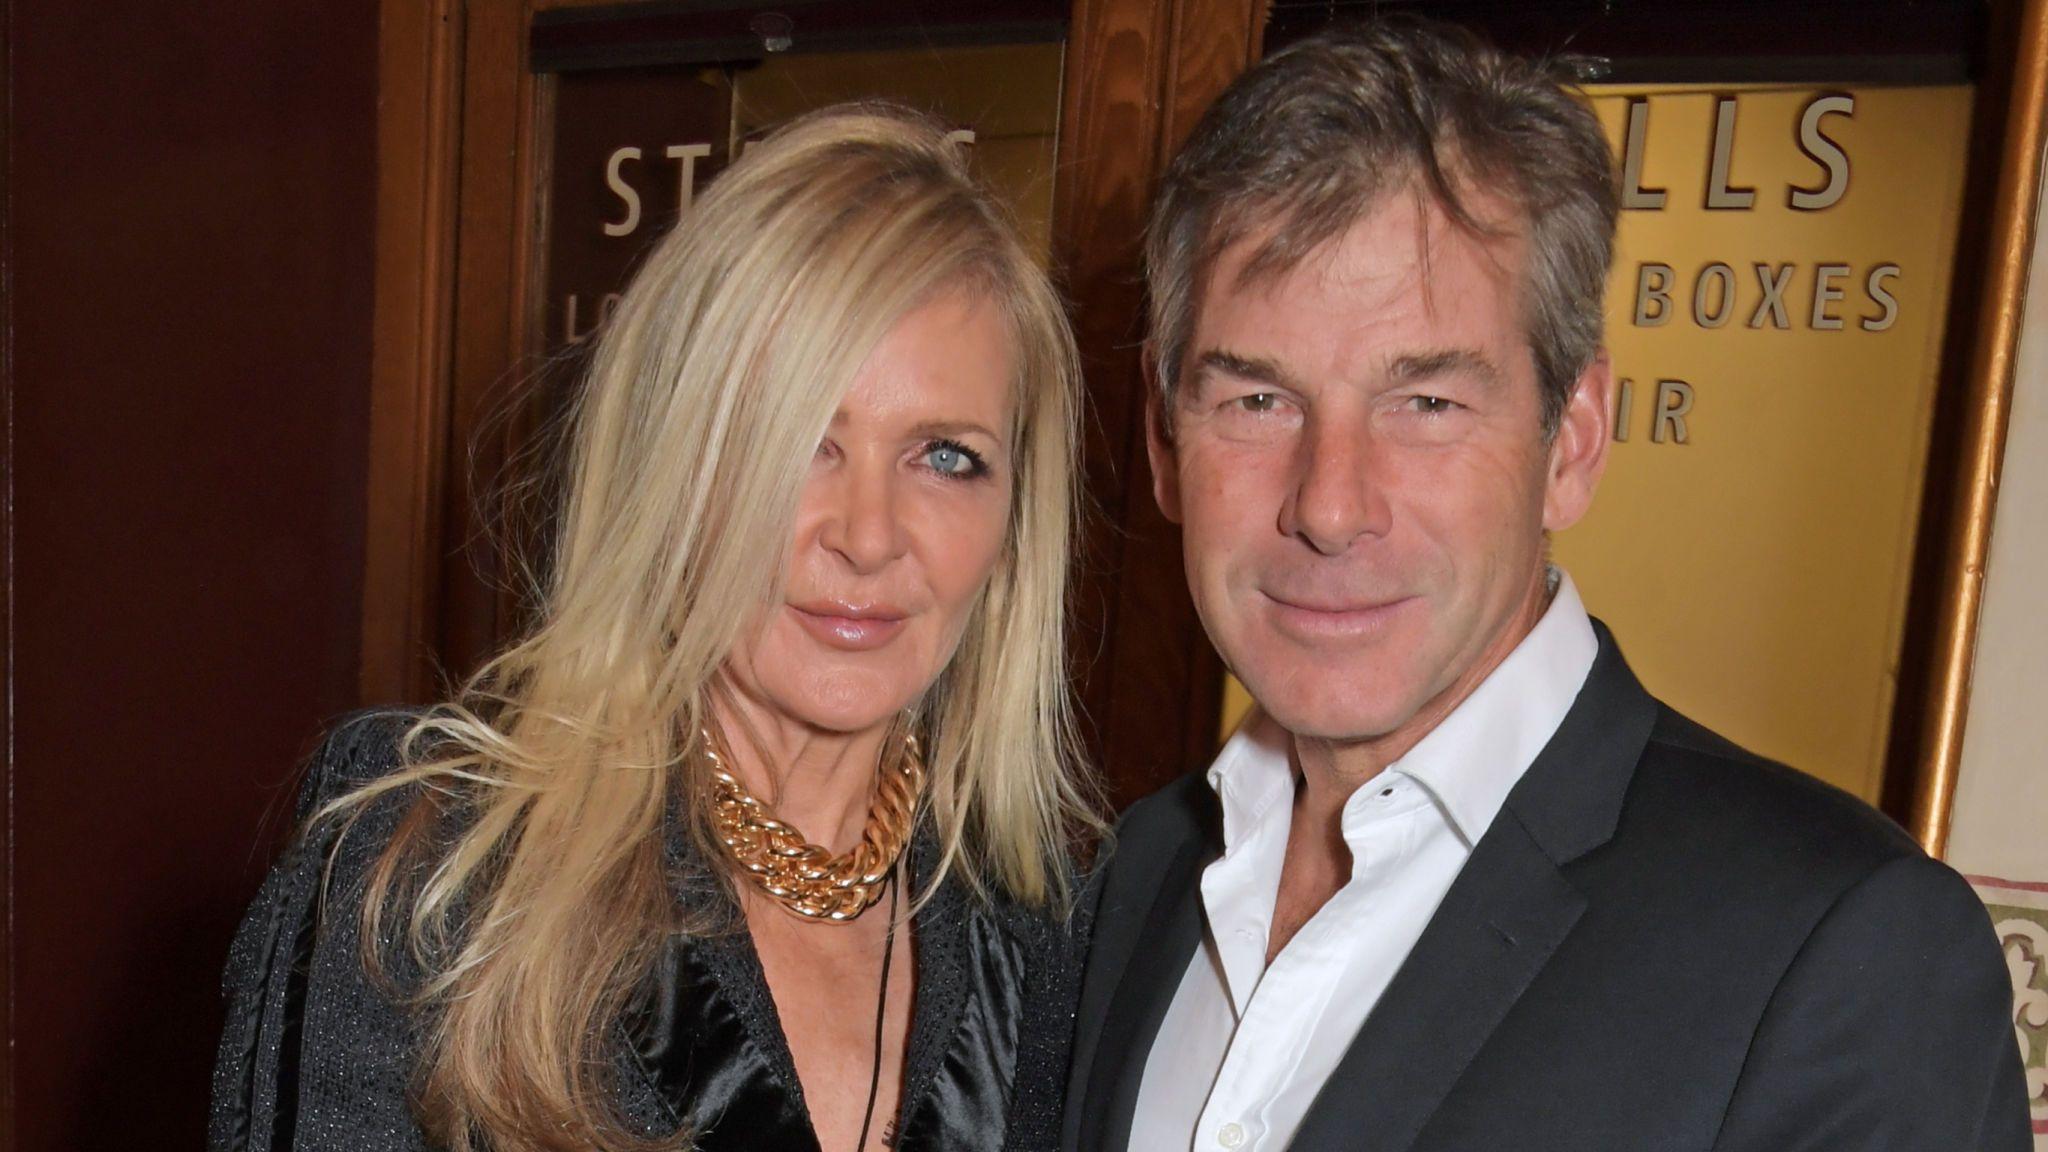 Fashion designer Amanda Wakeley and her partner Hugh Morrison